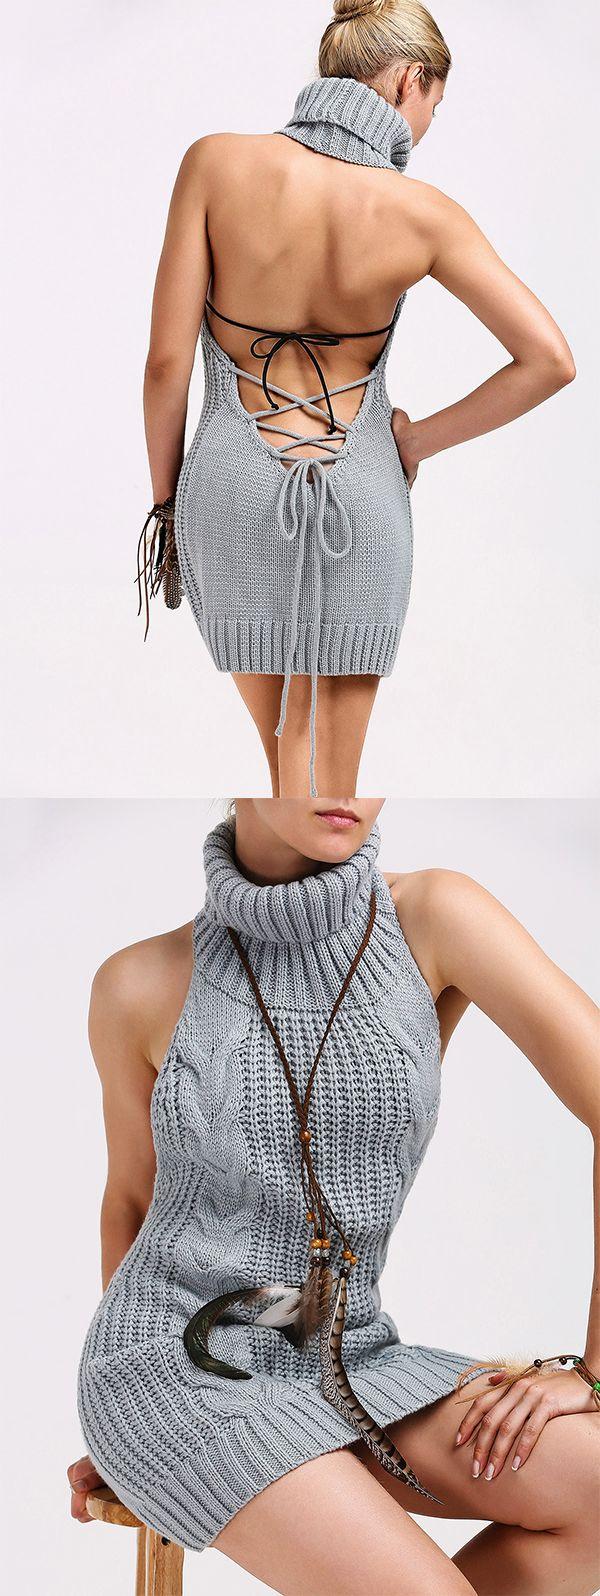 19+ Backless sweater dress ideas